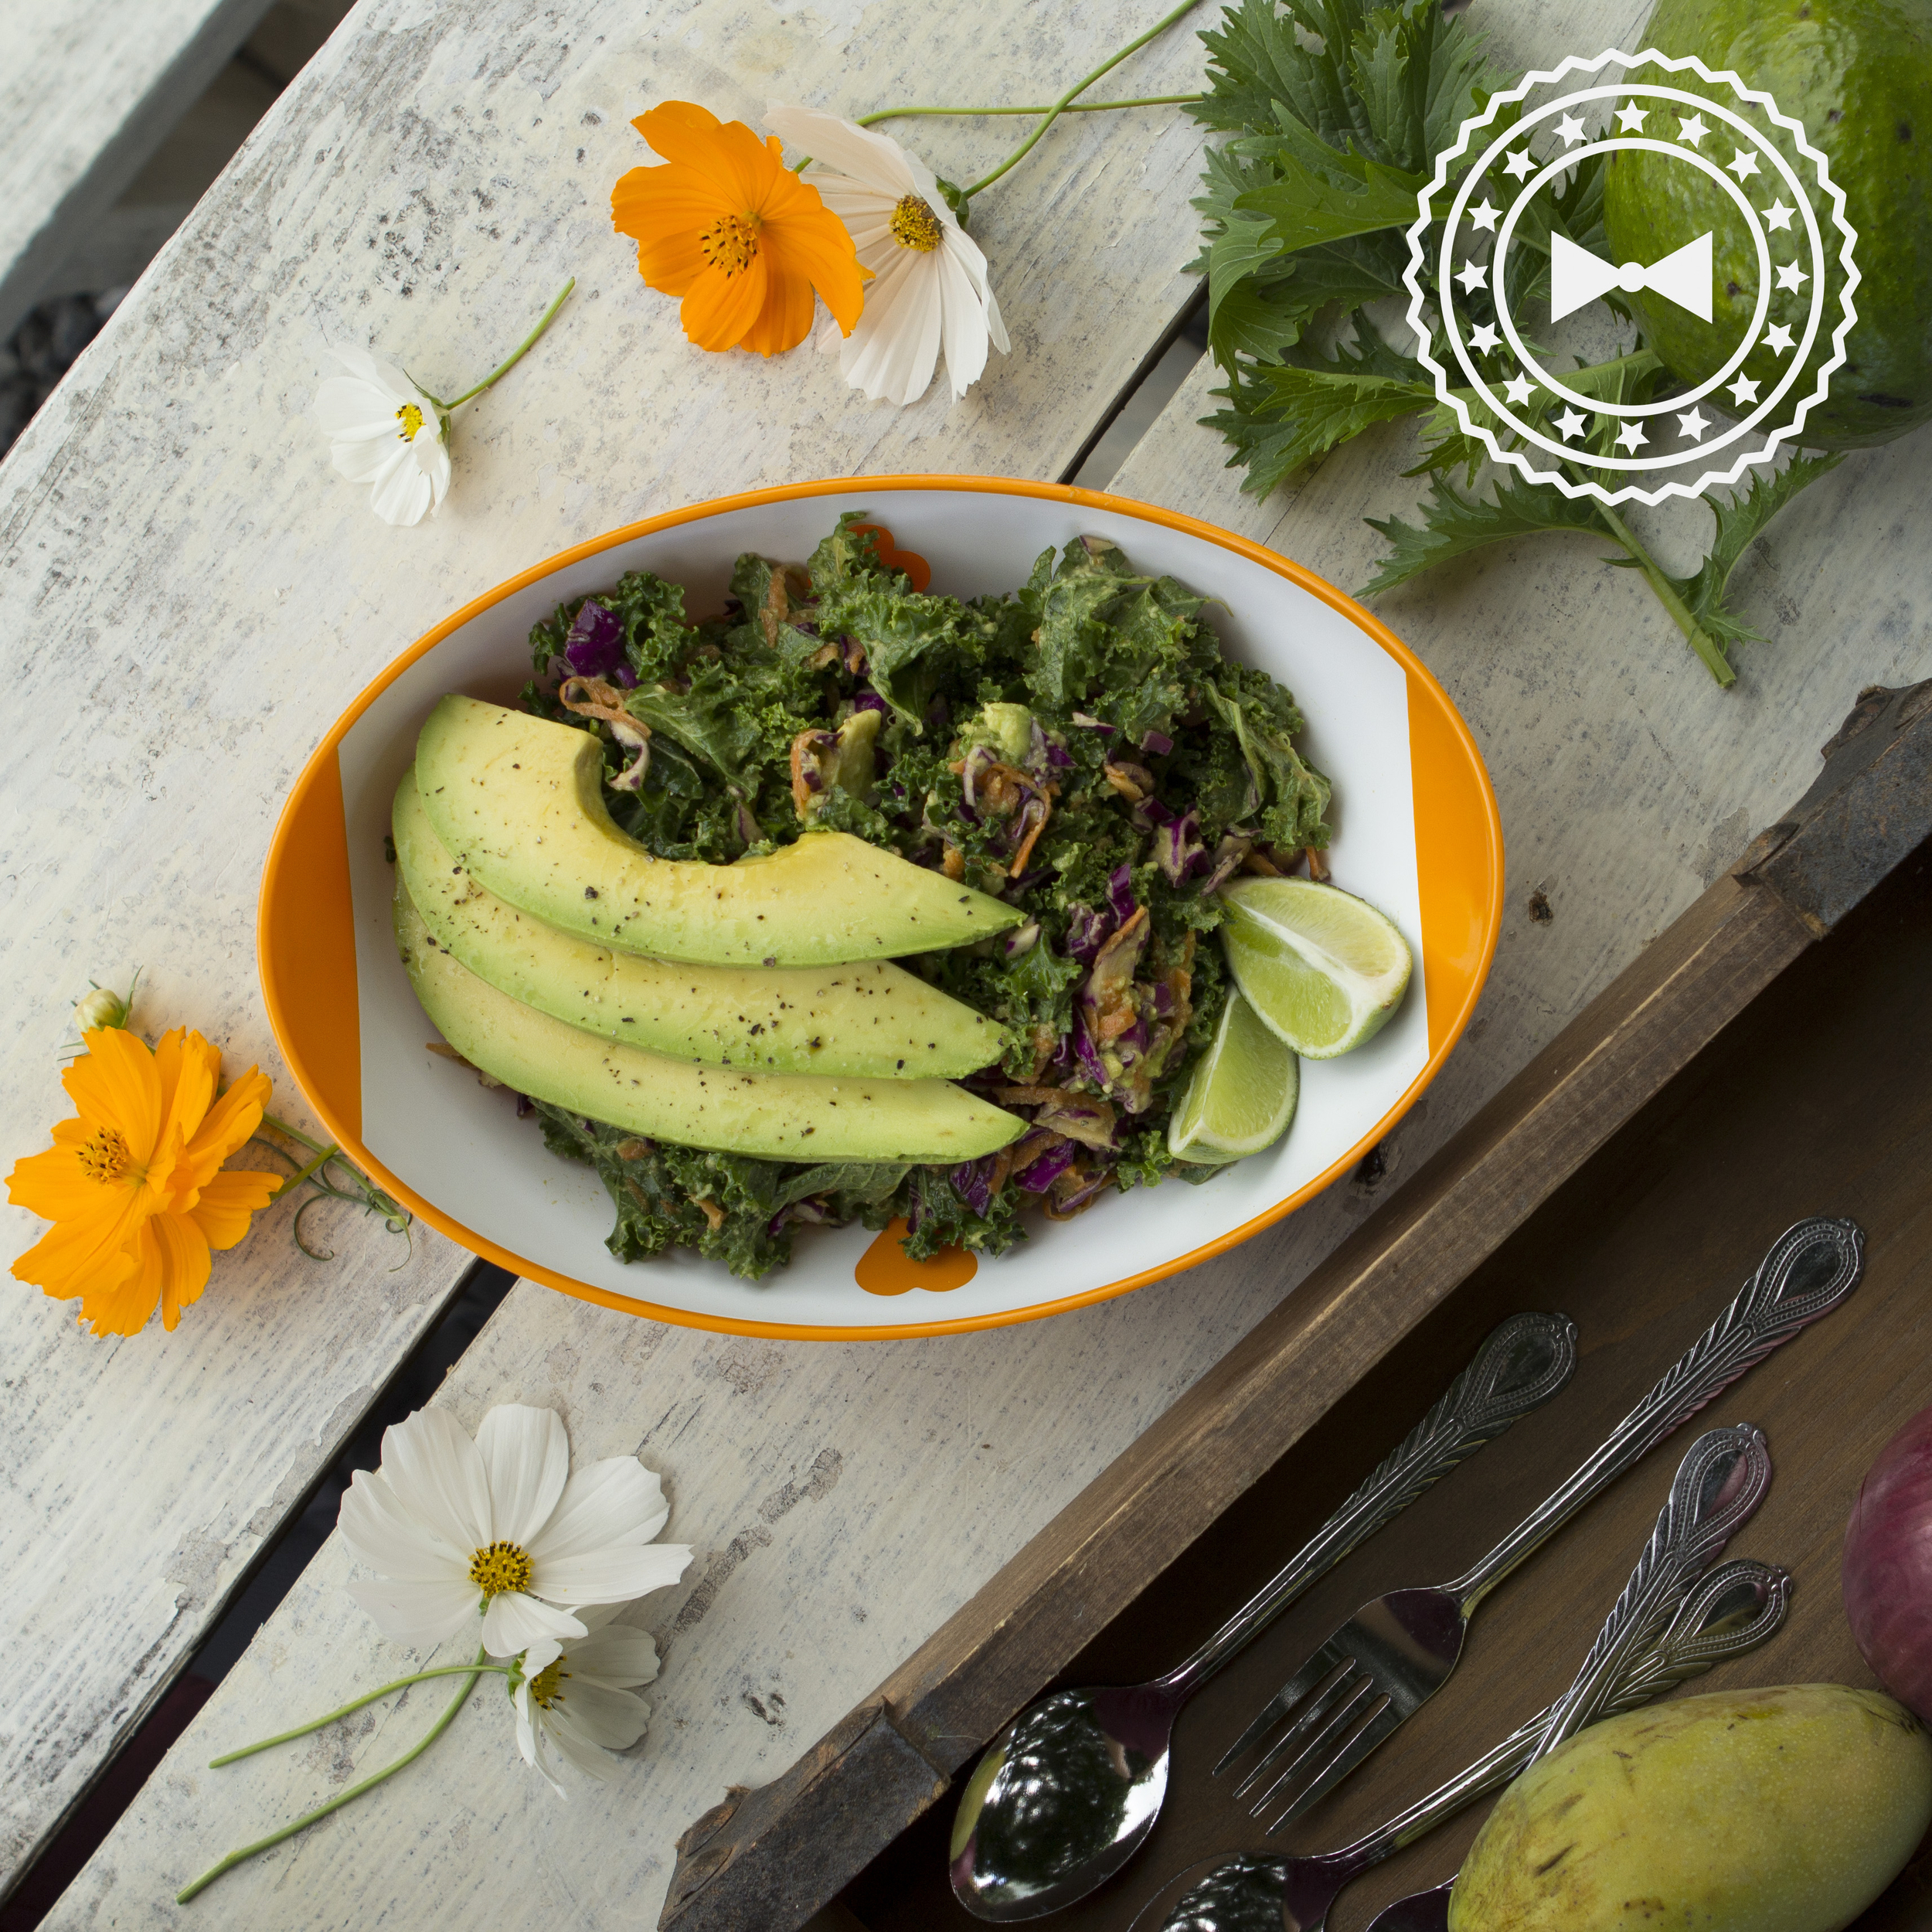 Kaavocado Salad